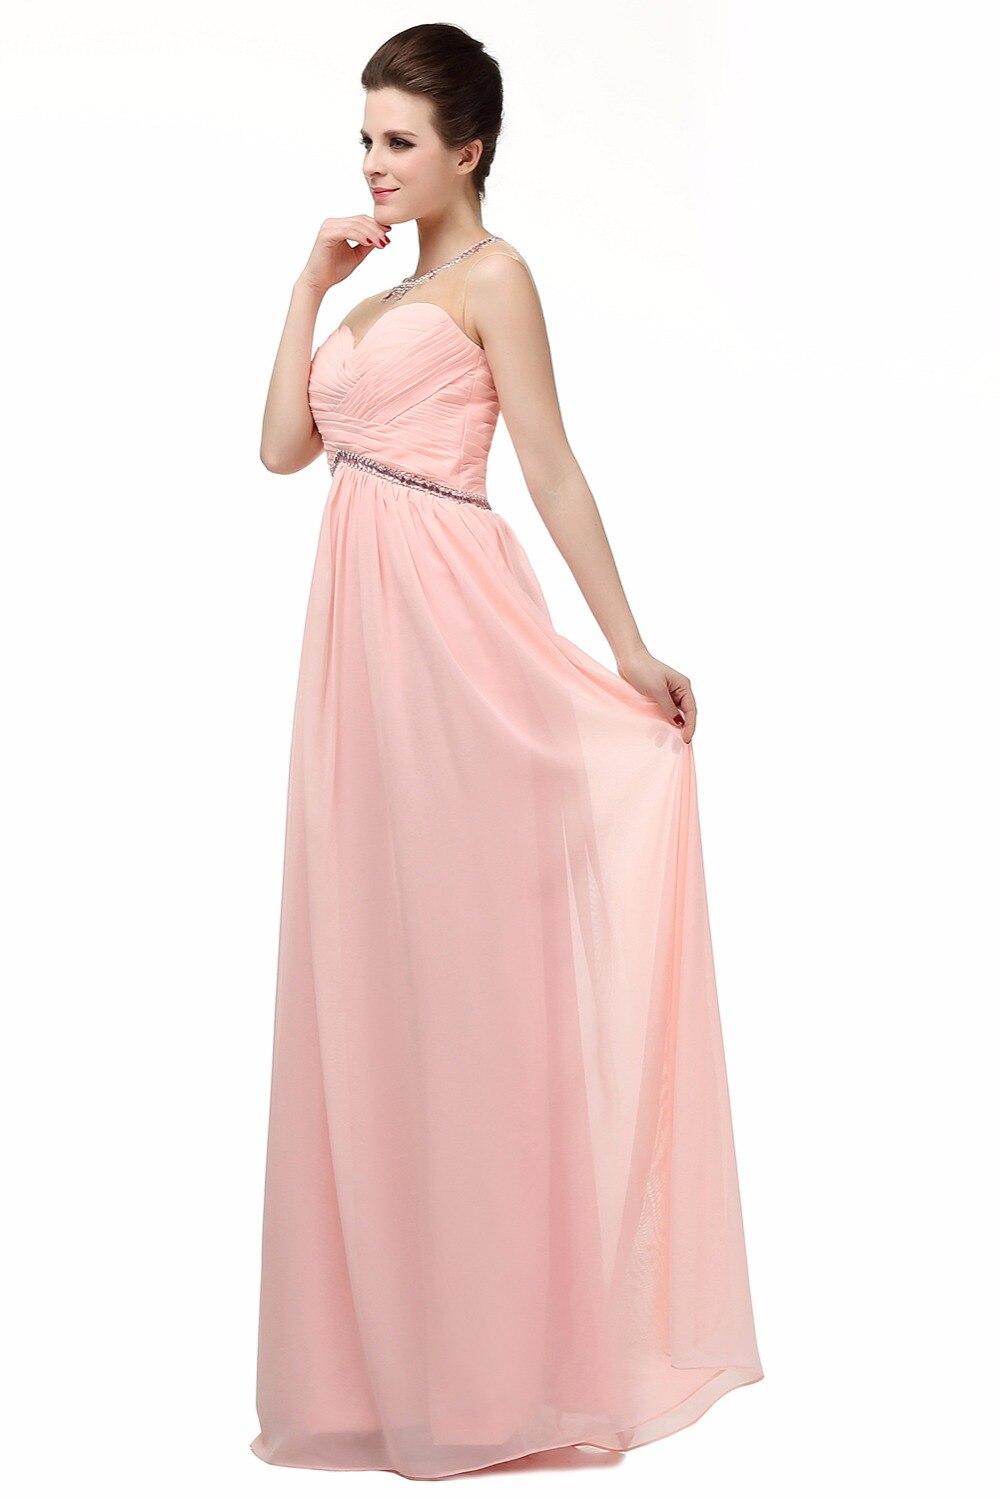 Blush Pink Prom Dresses Long 2017 Sheer Robe De Soiree Longue ...